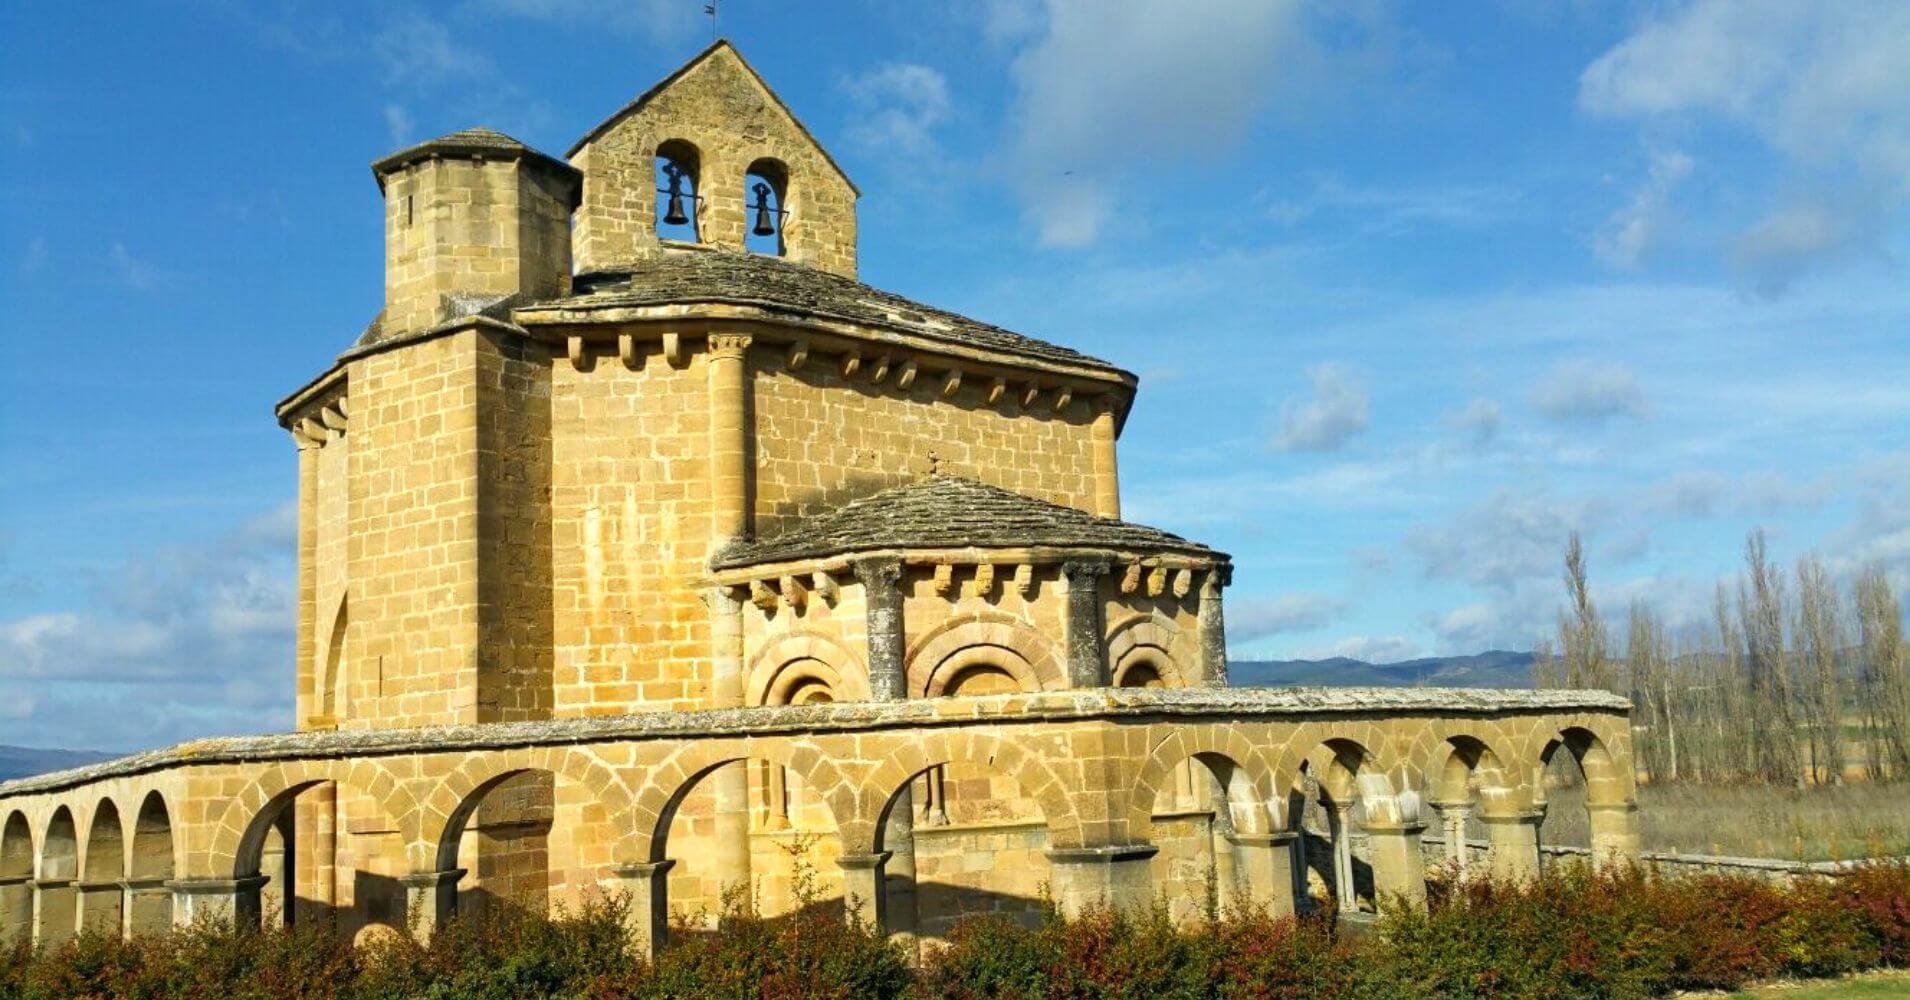 Camino de Santiago Aragonés 6. Ermita de Nuestra Señora de Eunate, Muruzábal. Navarra.